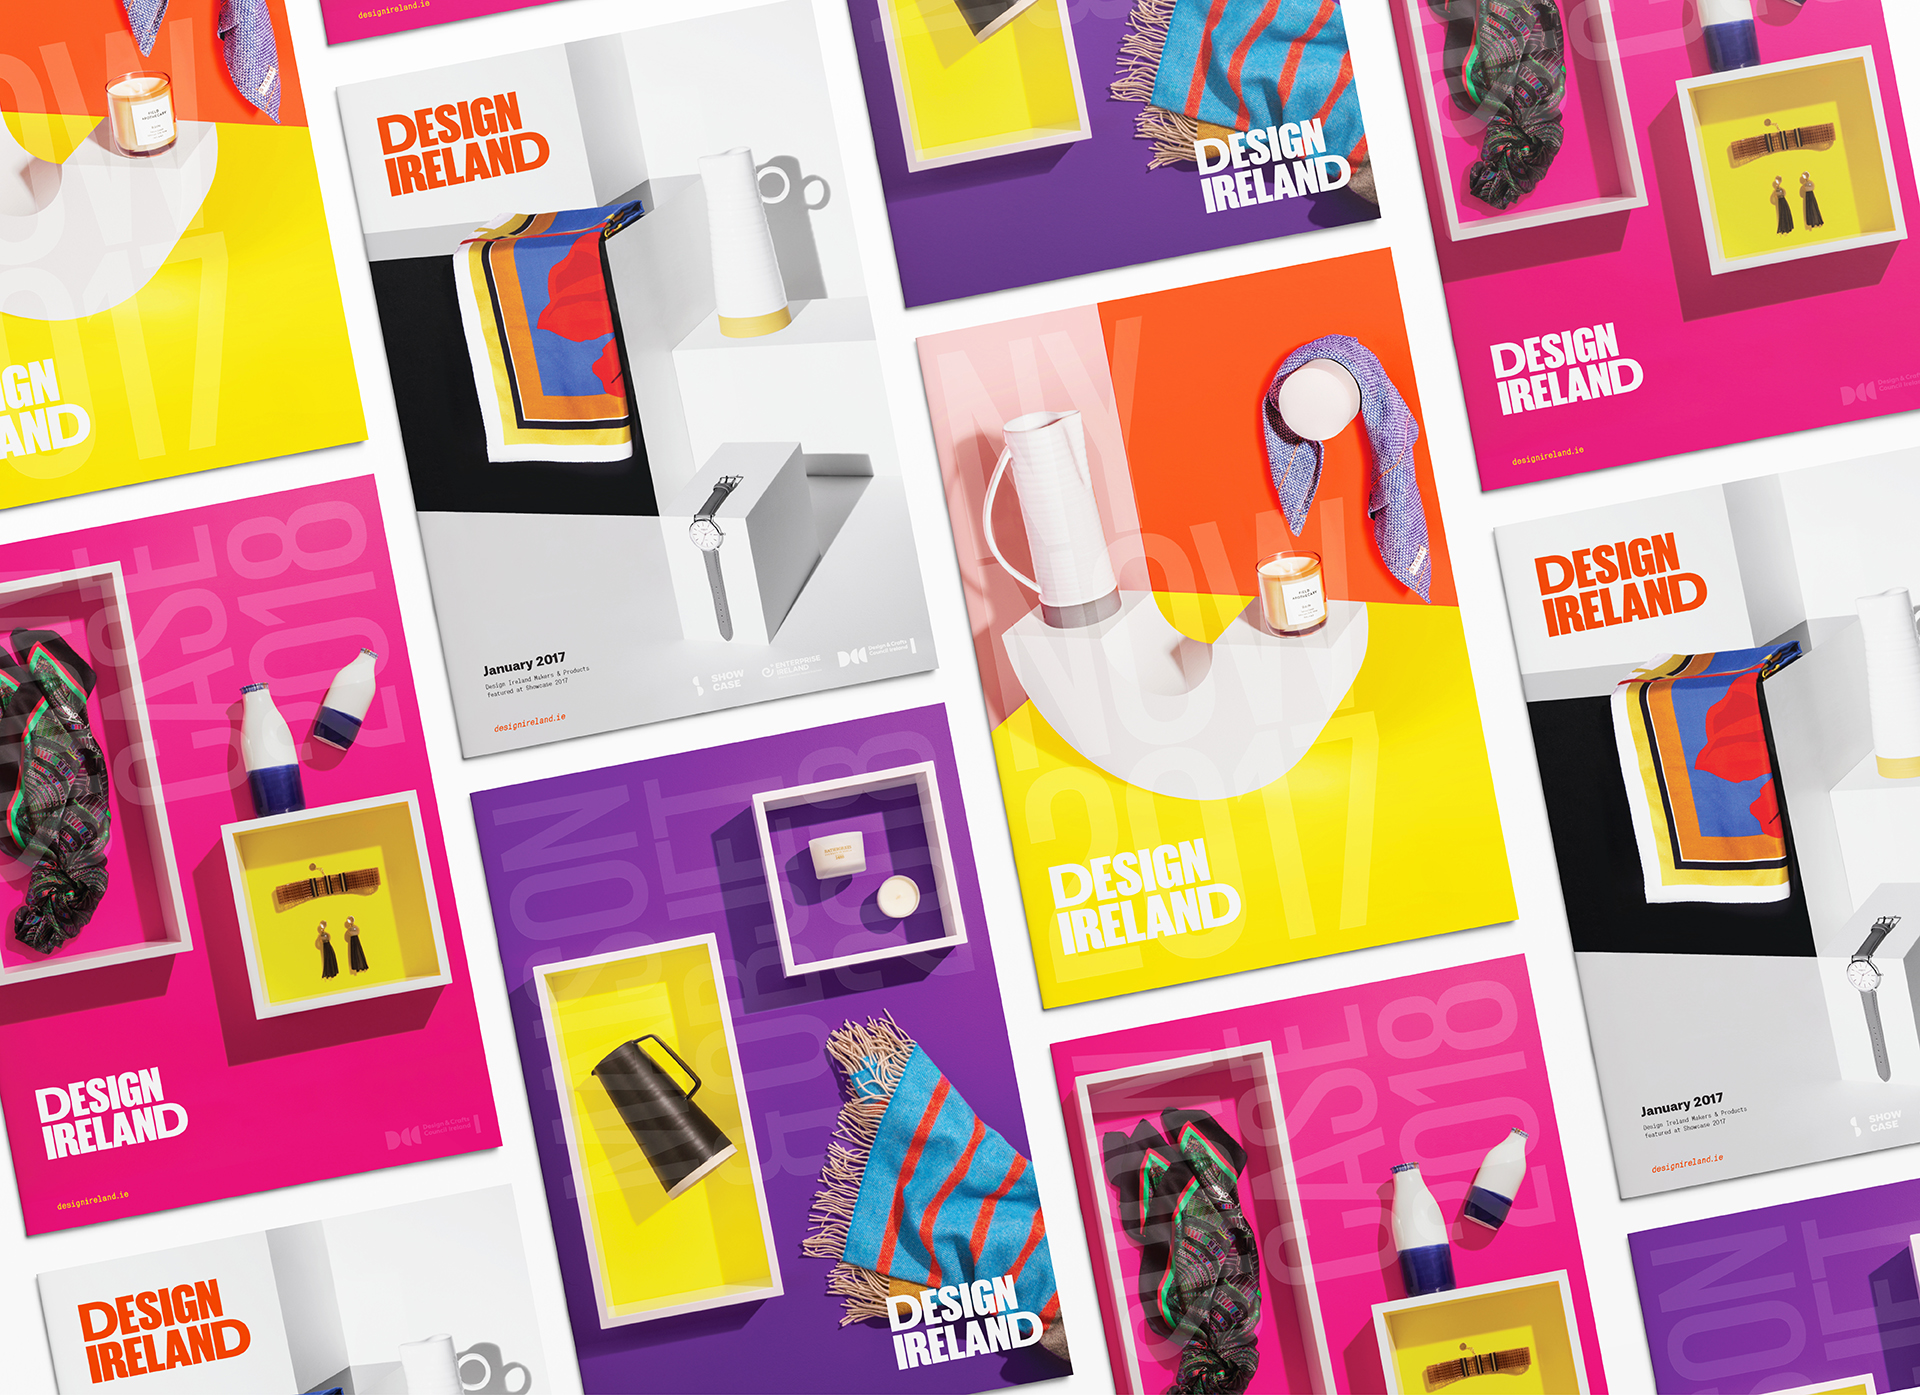 Togetherwecreate_DesignIreland_Brochures.jpg